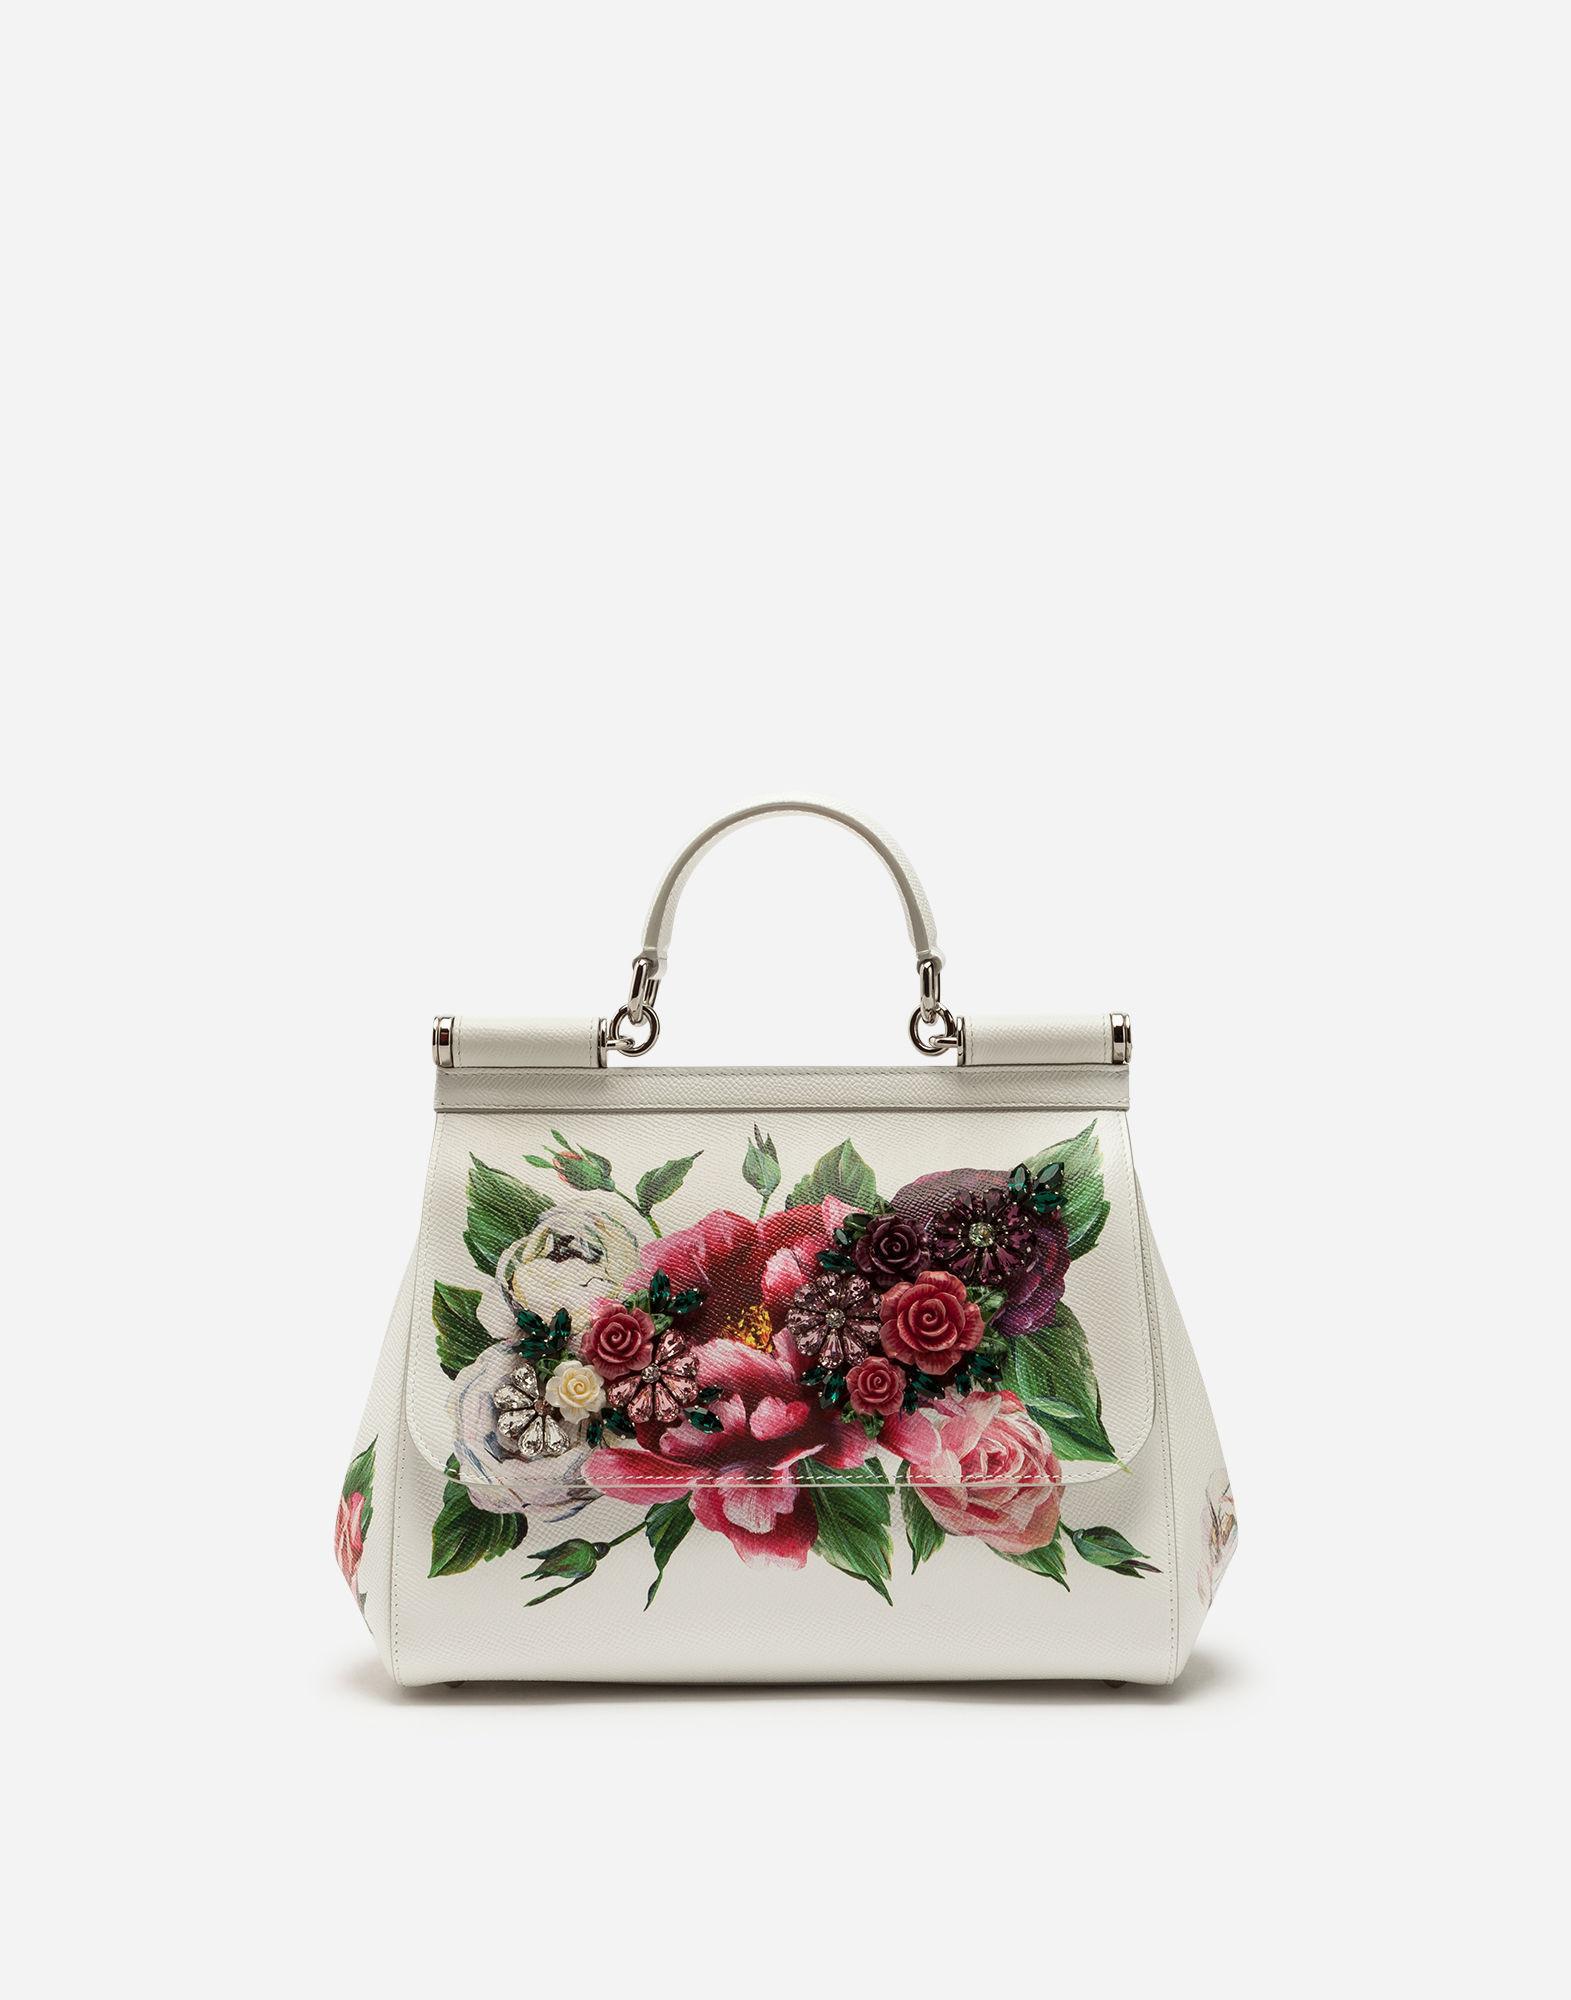 dce03c6aa2 Dolce   Gabbana Medium Sicily Bag In Peony-Print Dauphine Calfskin In Cream